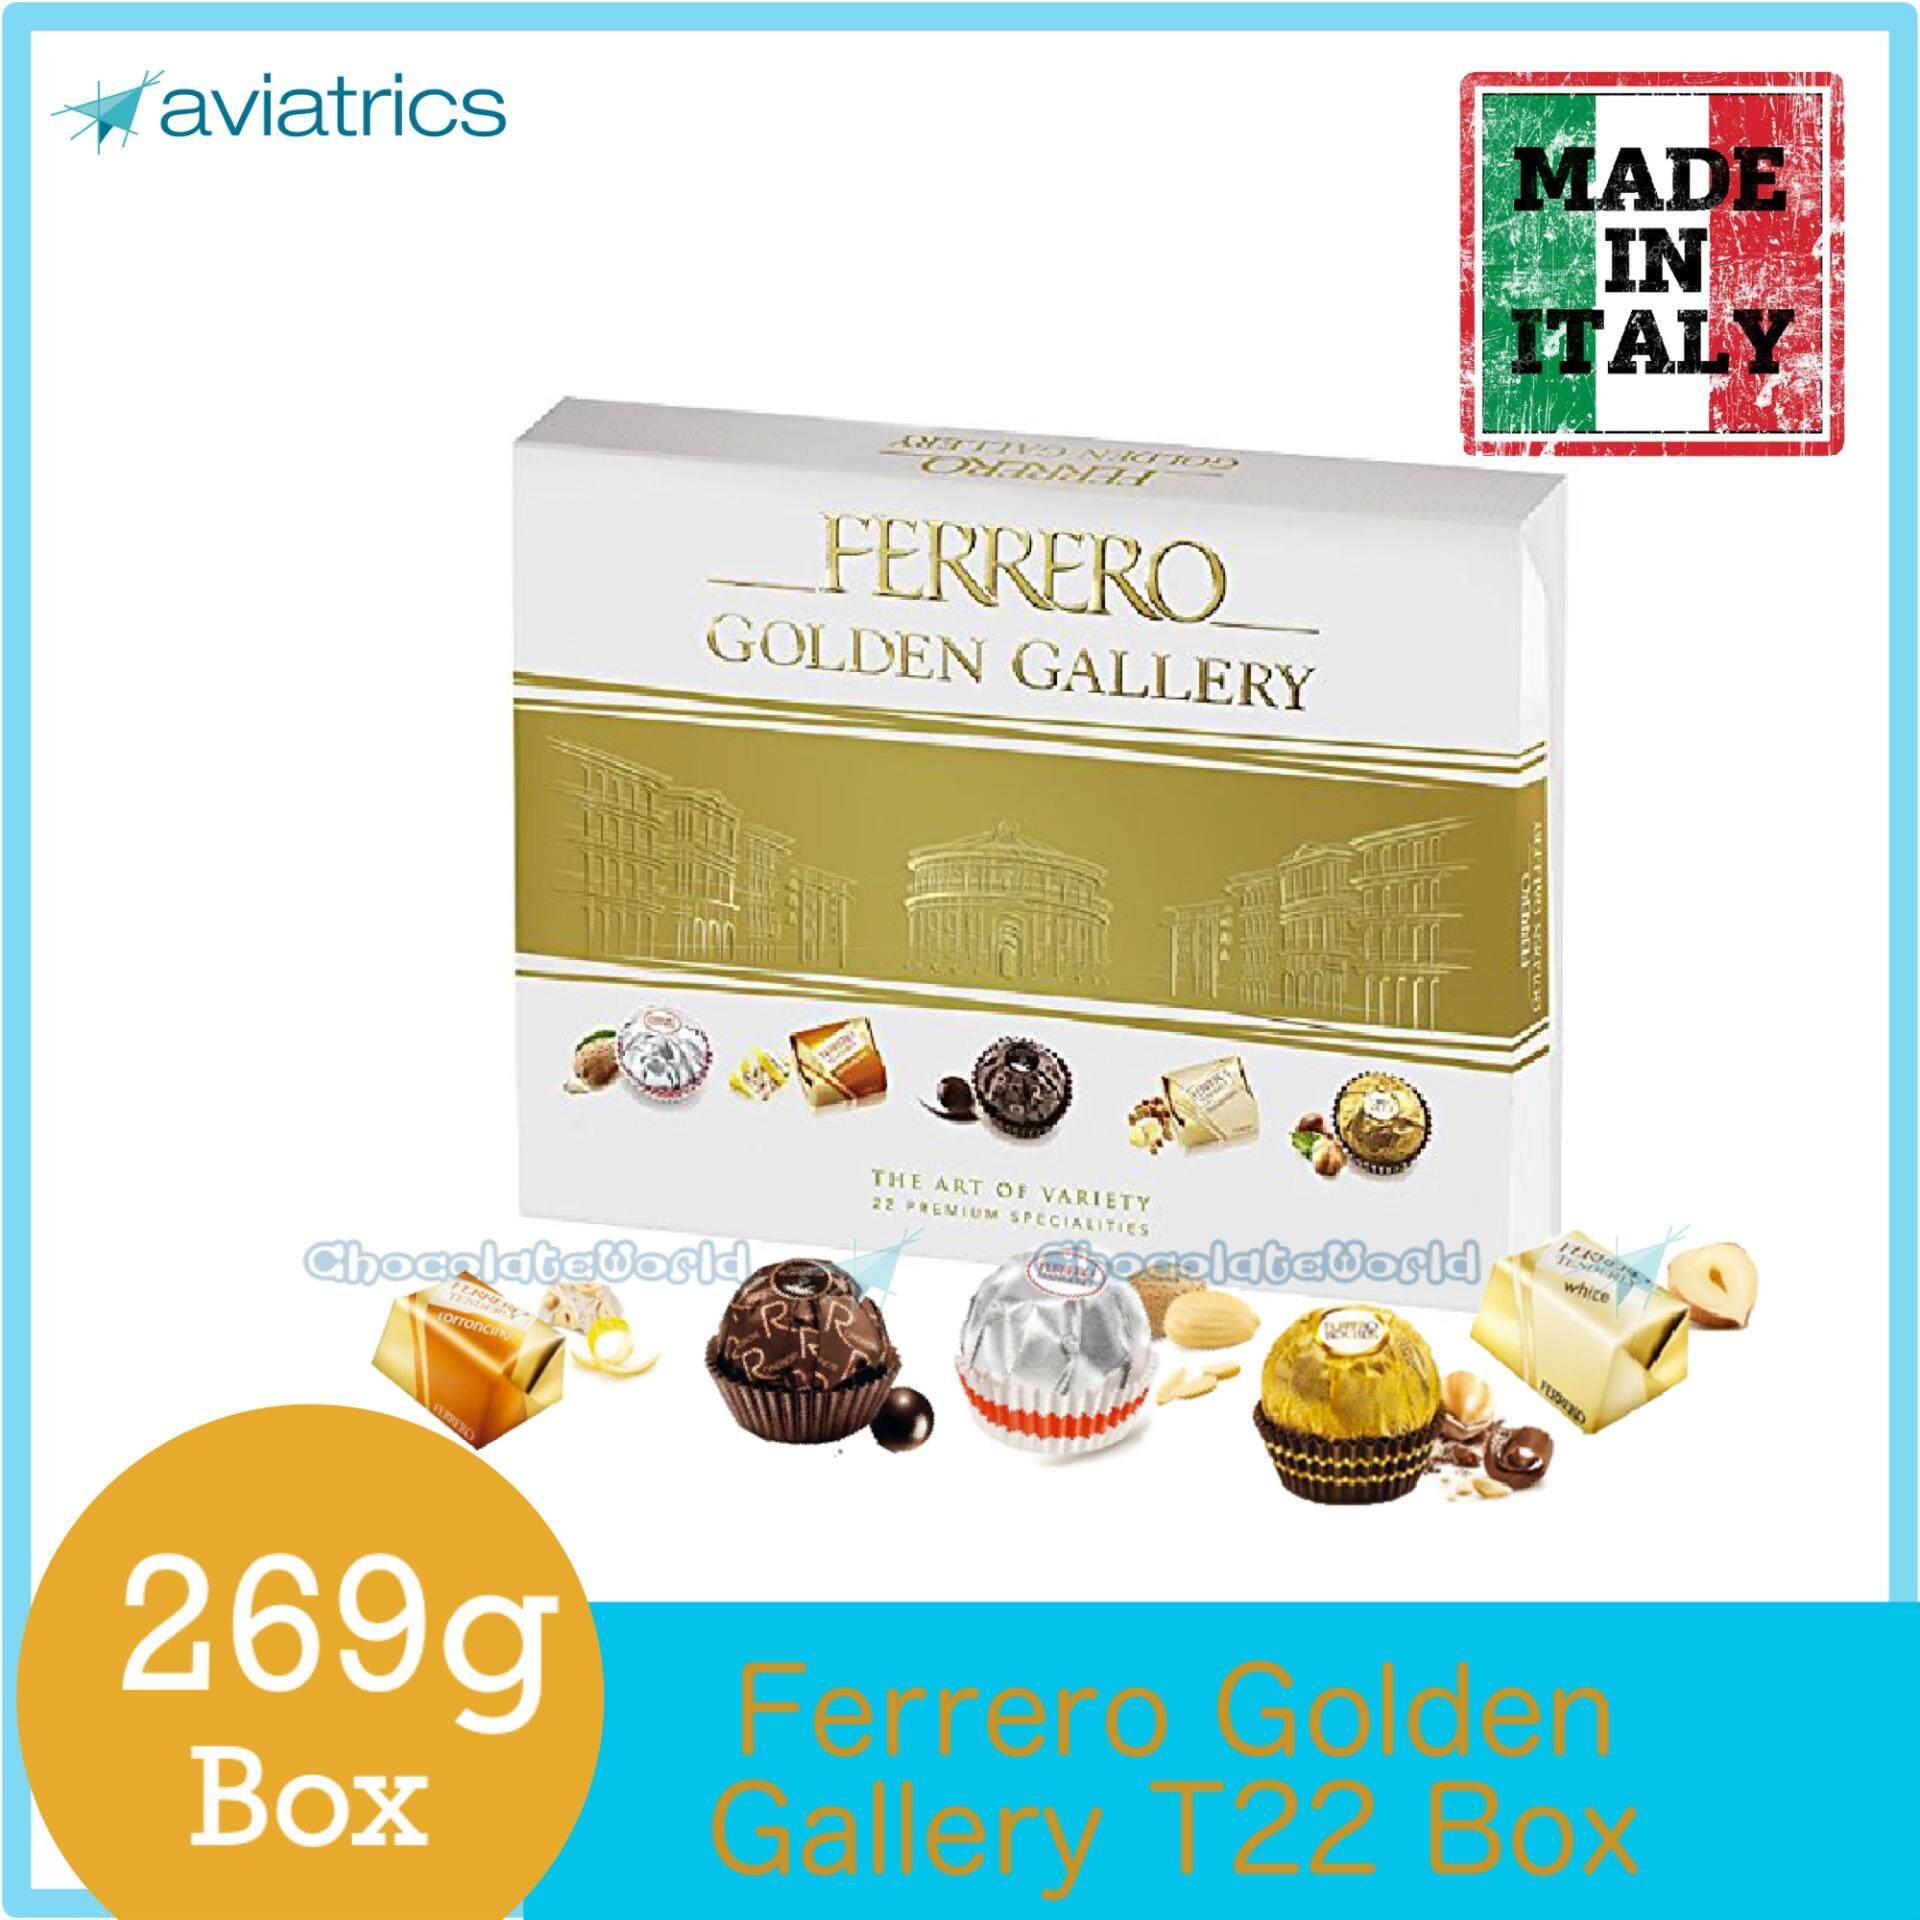 Ferrero Golden Gallery 22T 216g (Made in Germany)